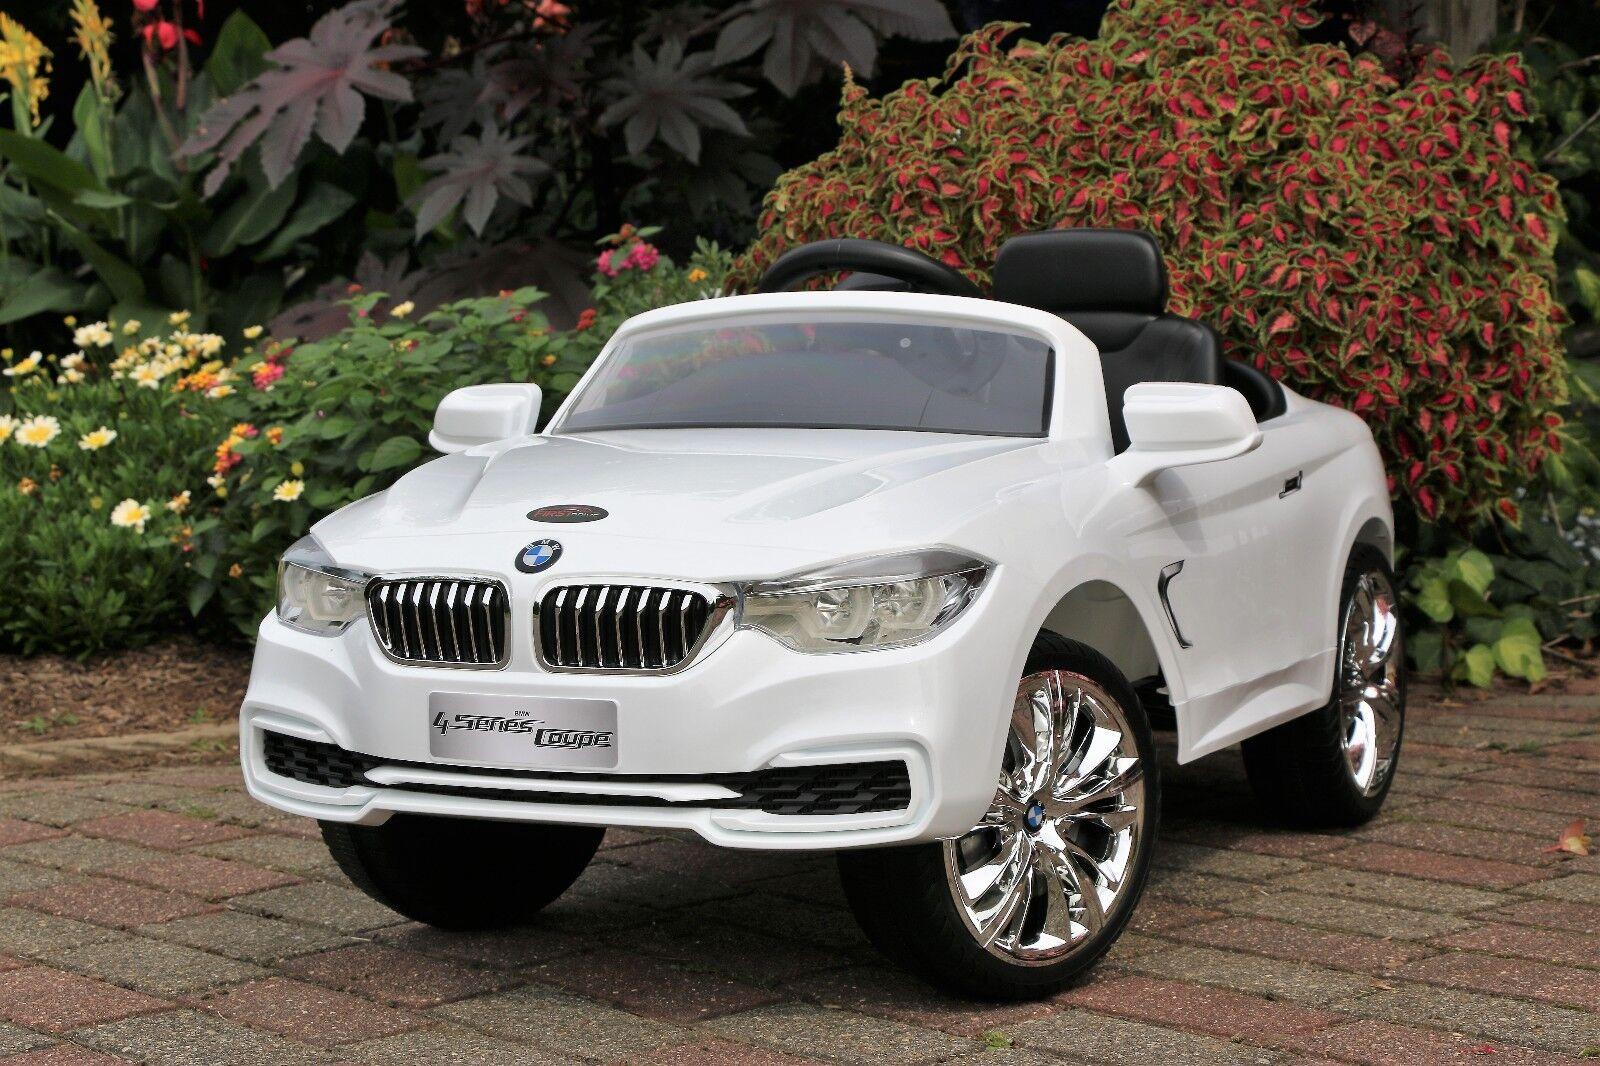 BMW 4-Series Kids Dual Motor Ride-On Car White Licensed Licensed Licensed Electric 12V with Remote bad7fe